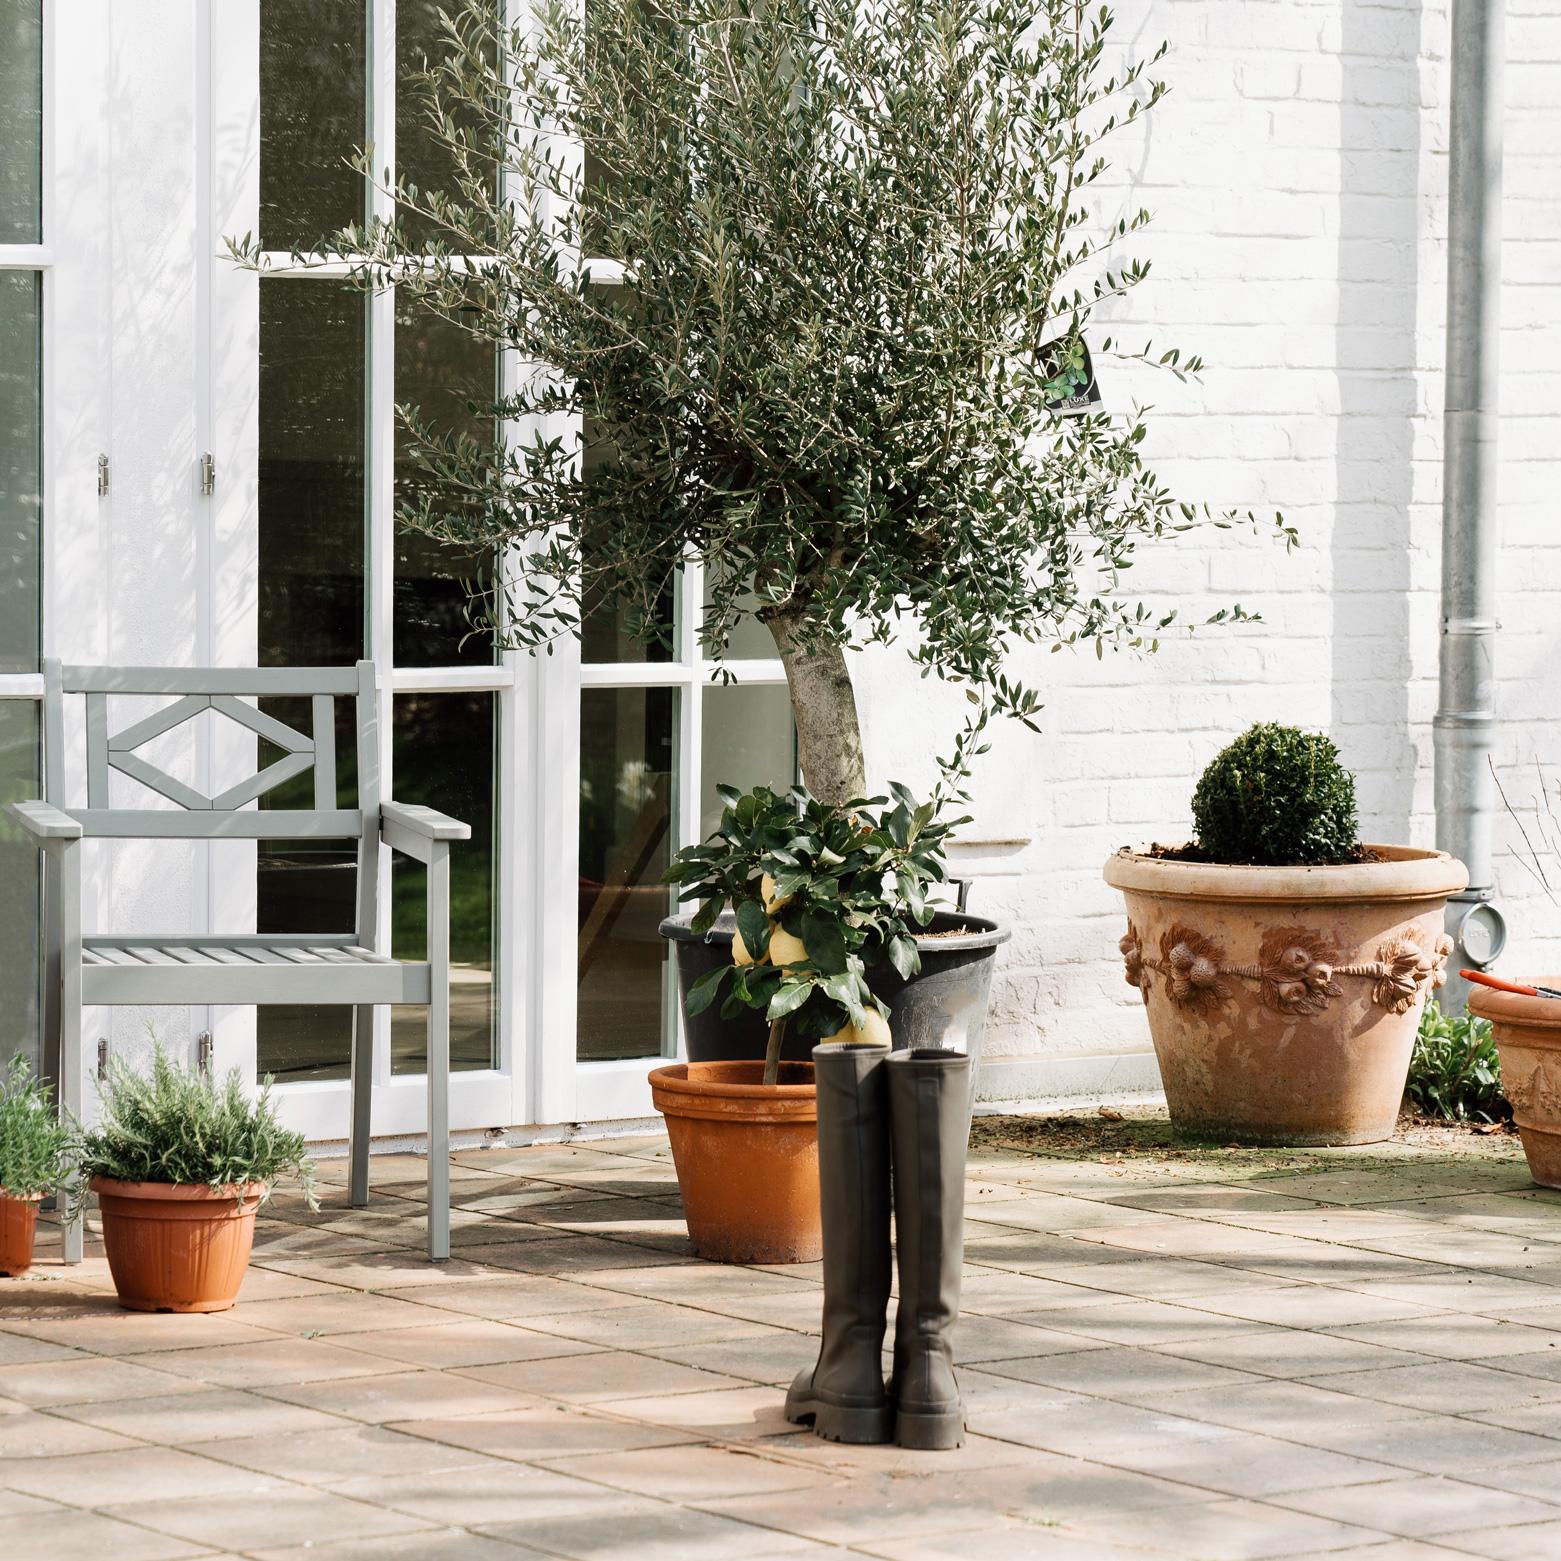 media/image/kaell-gartengestaltung-terrasse.jpg